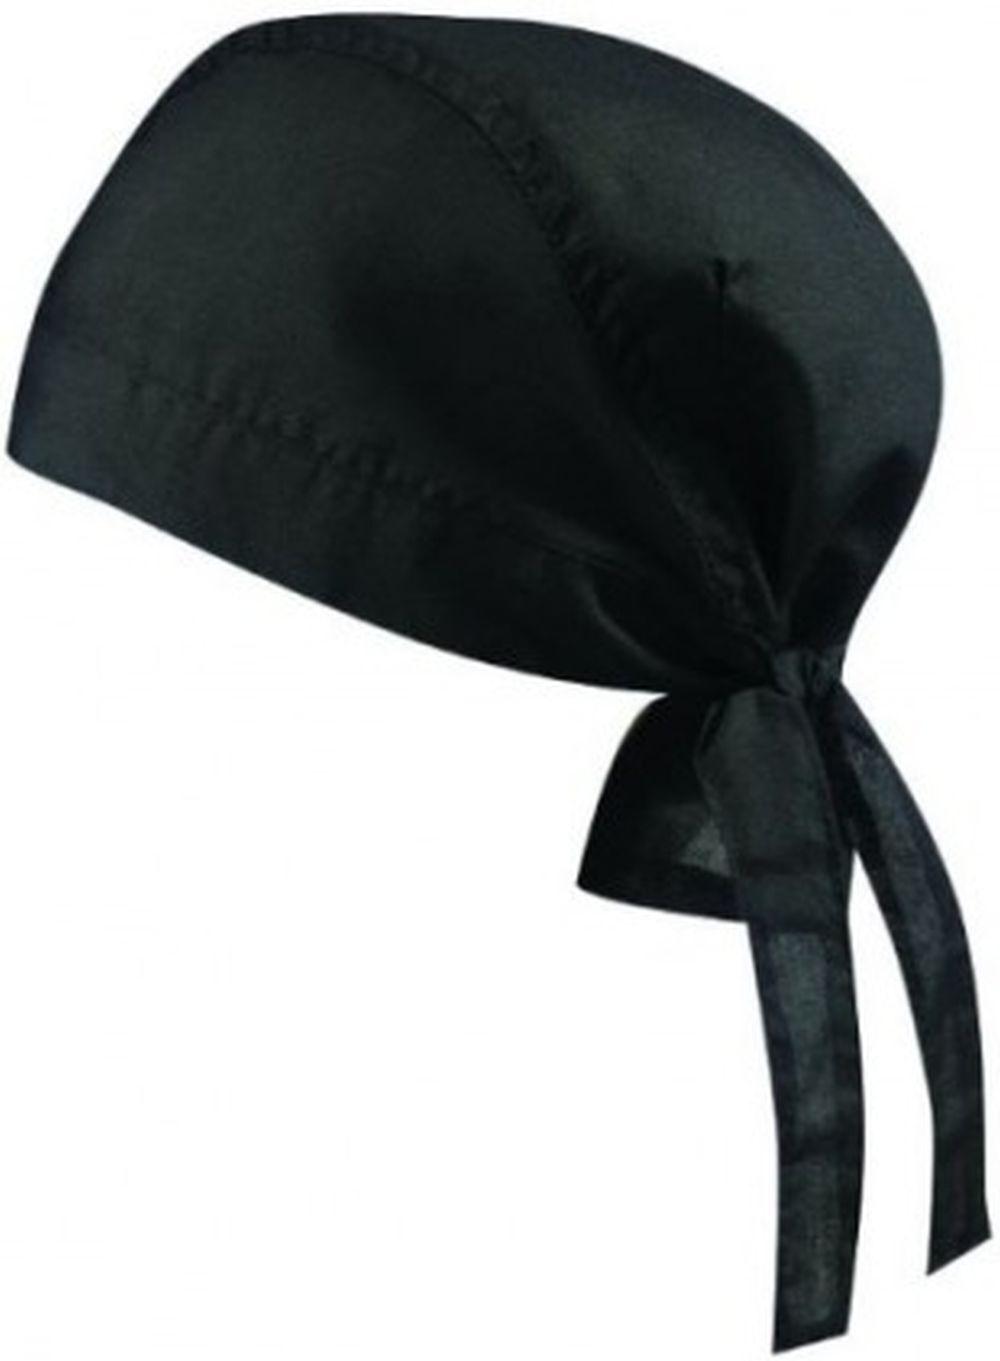 Bandana Hut Mütze Hat Kochbekleidung Kopftuch Farbe schwarz